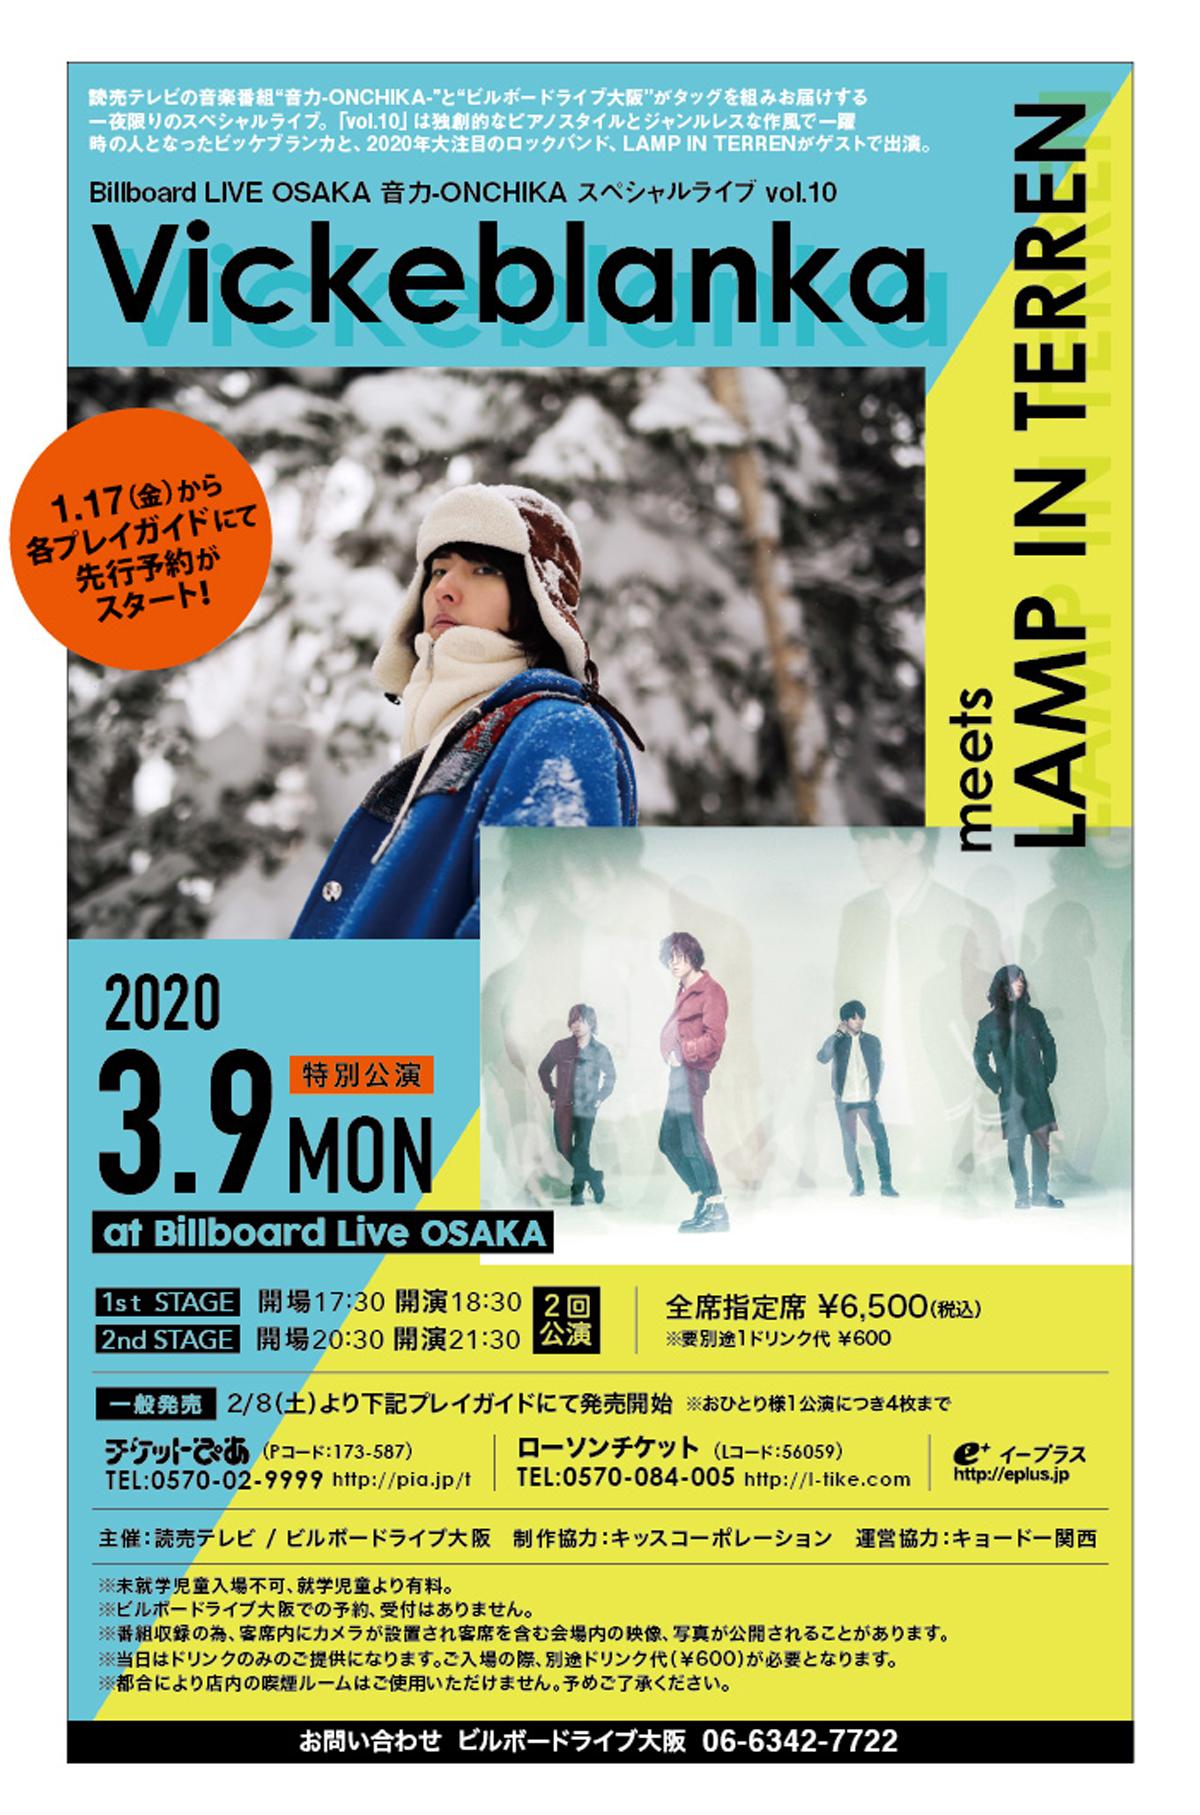 Billboard LIVE OSAKA 音力-ONCHIKA スペシャルライブ vol.10